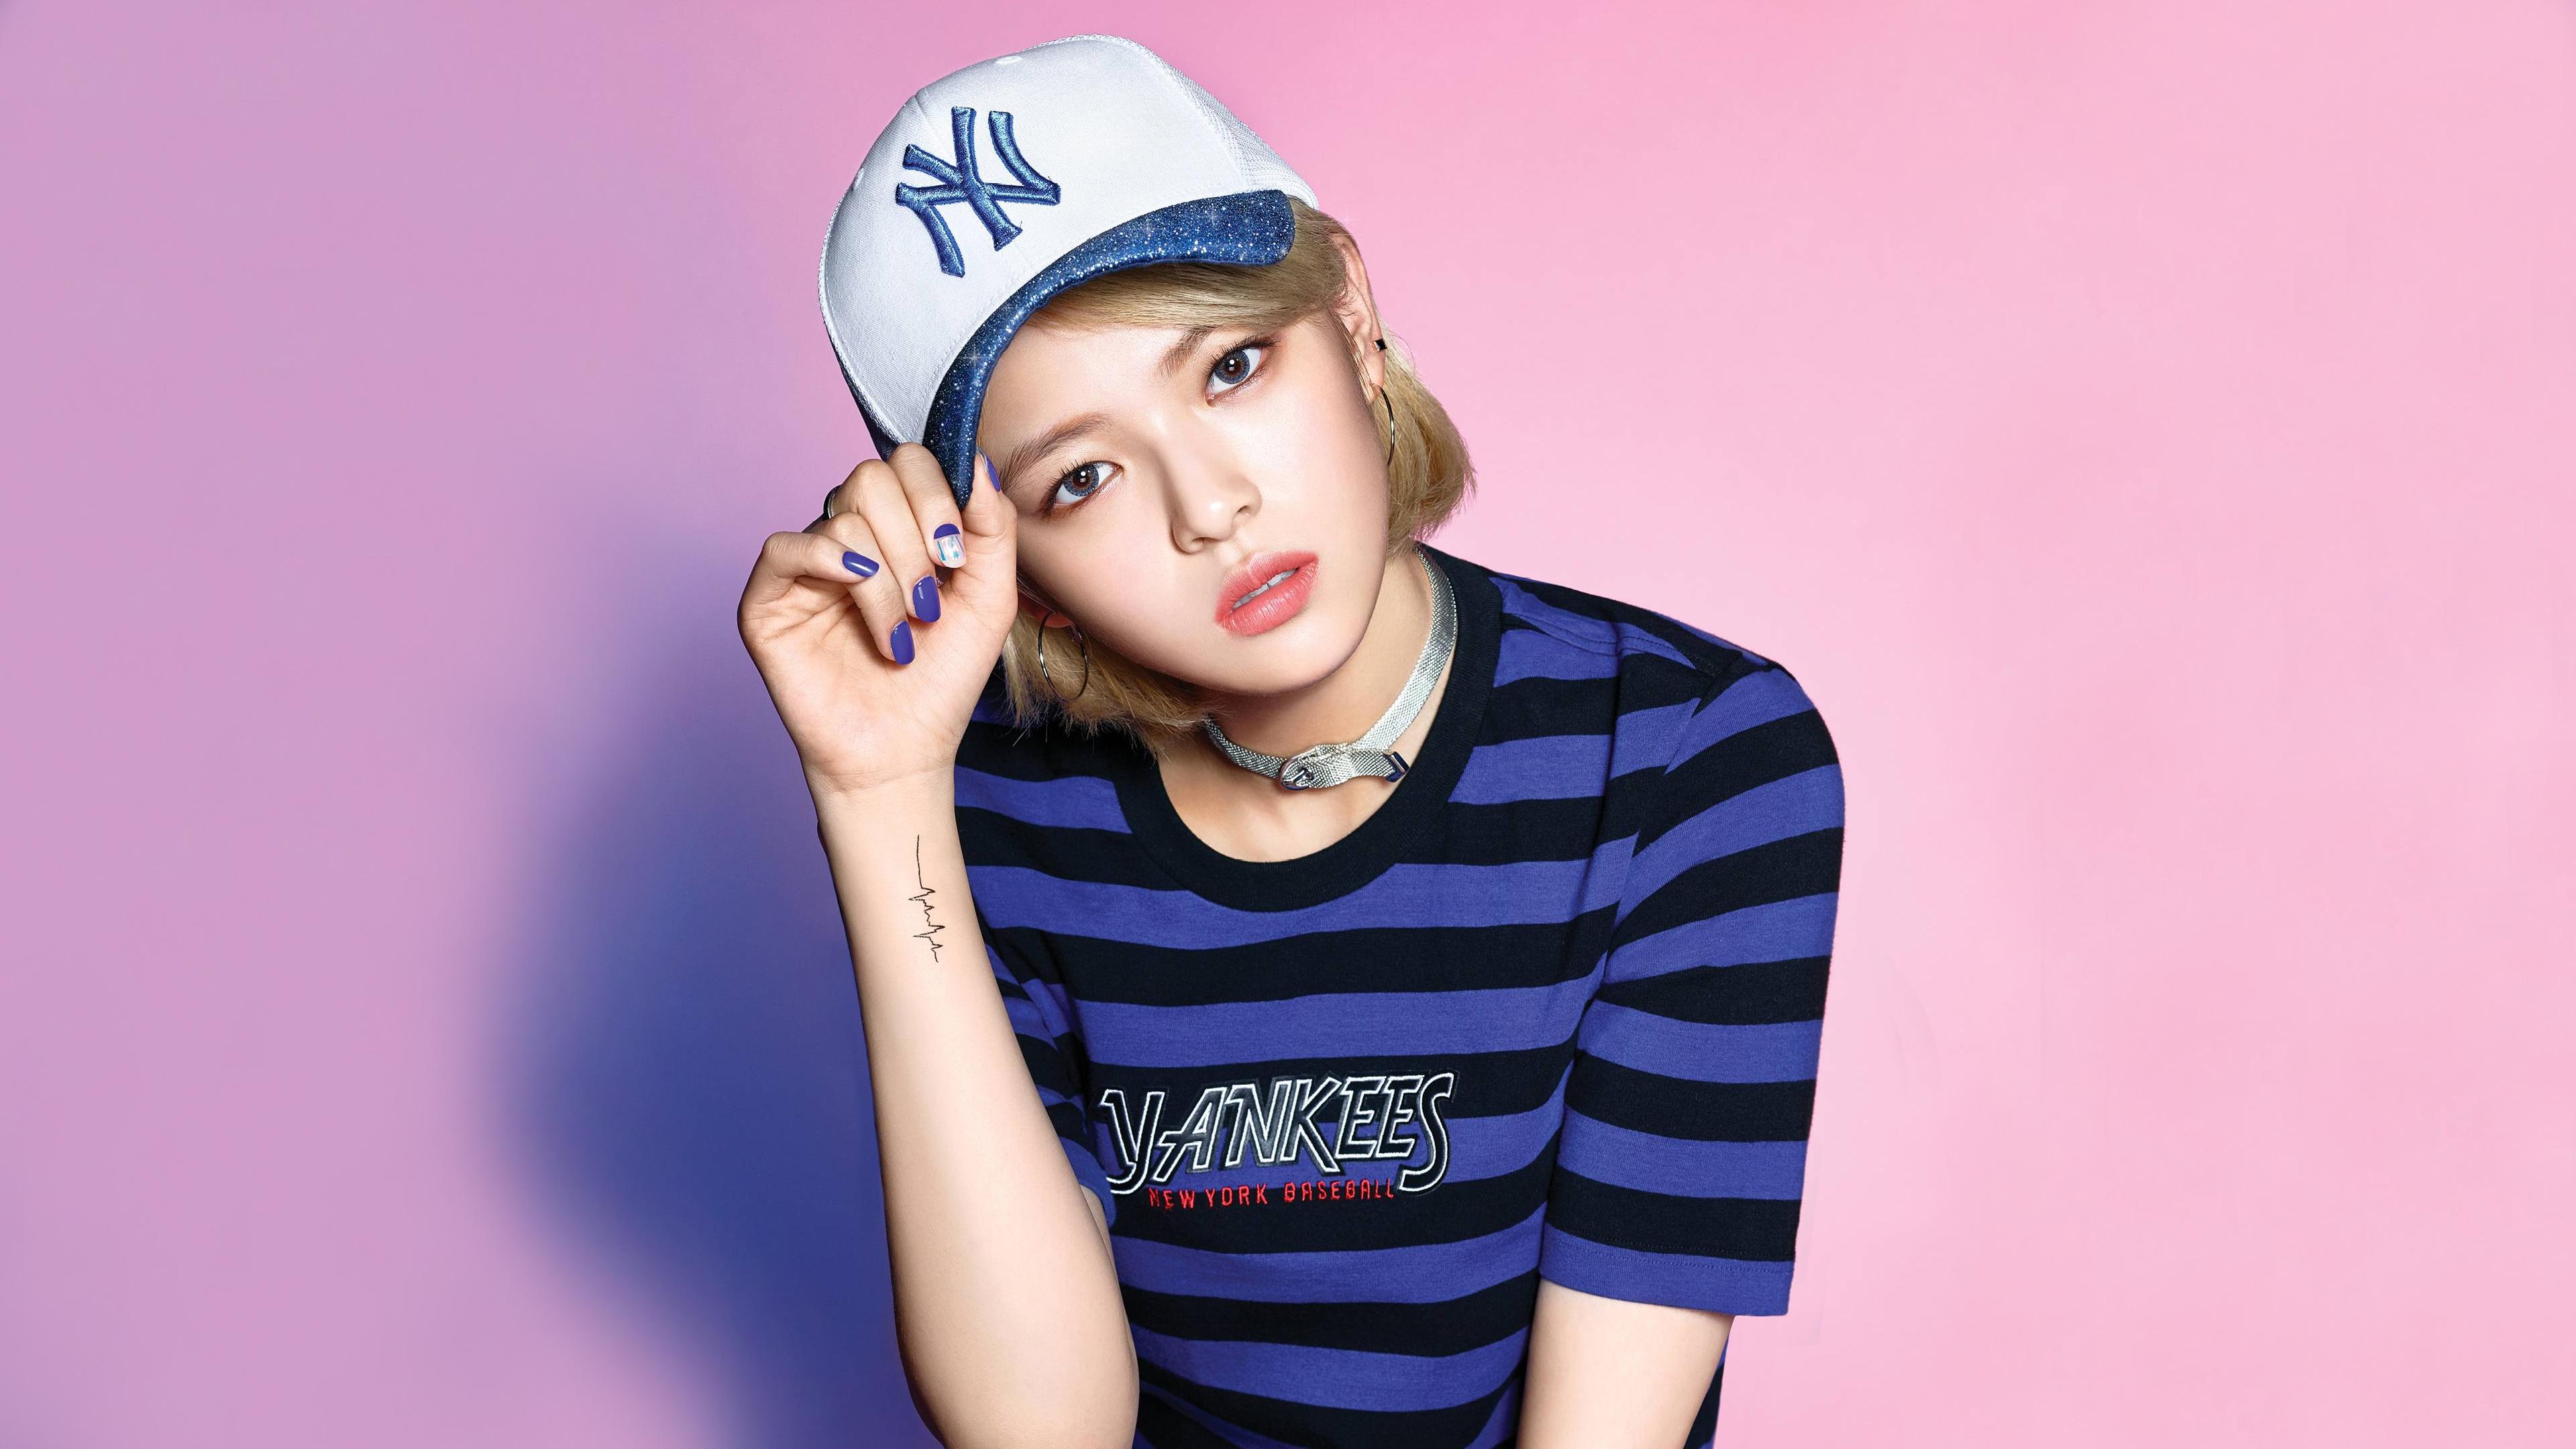 Jeongyeon TWICE 4K UHD Wallpaper K Pics 245 3840x2160